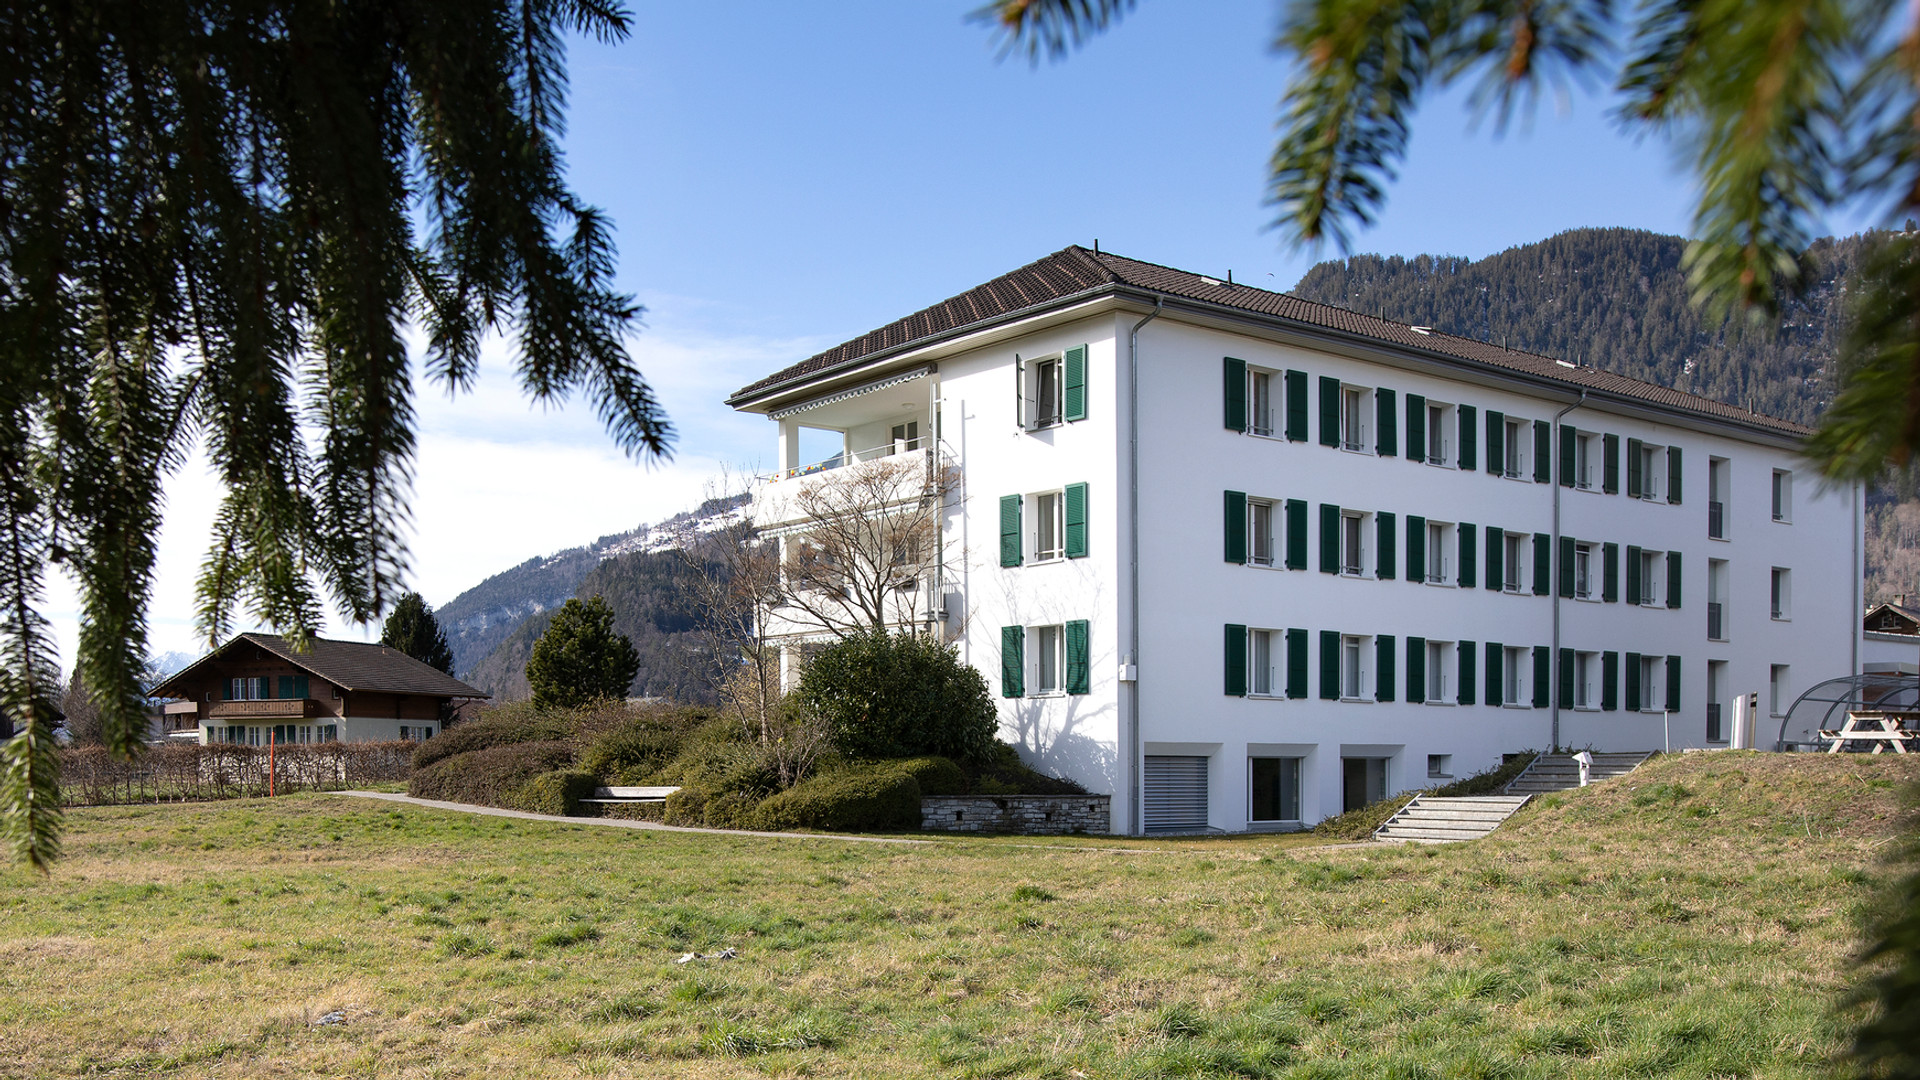 fmi_int_PsychiatrieStation_Gebäude.jpg